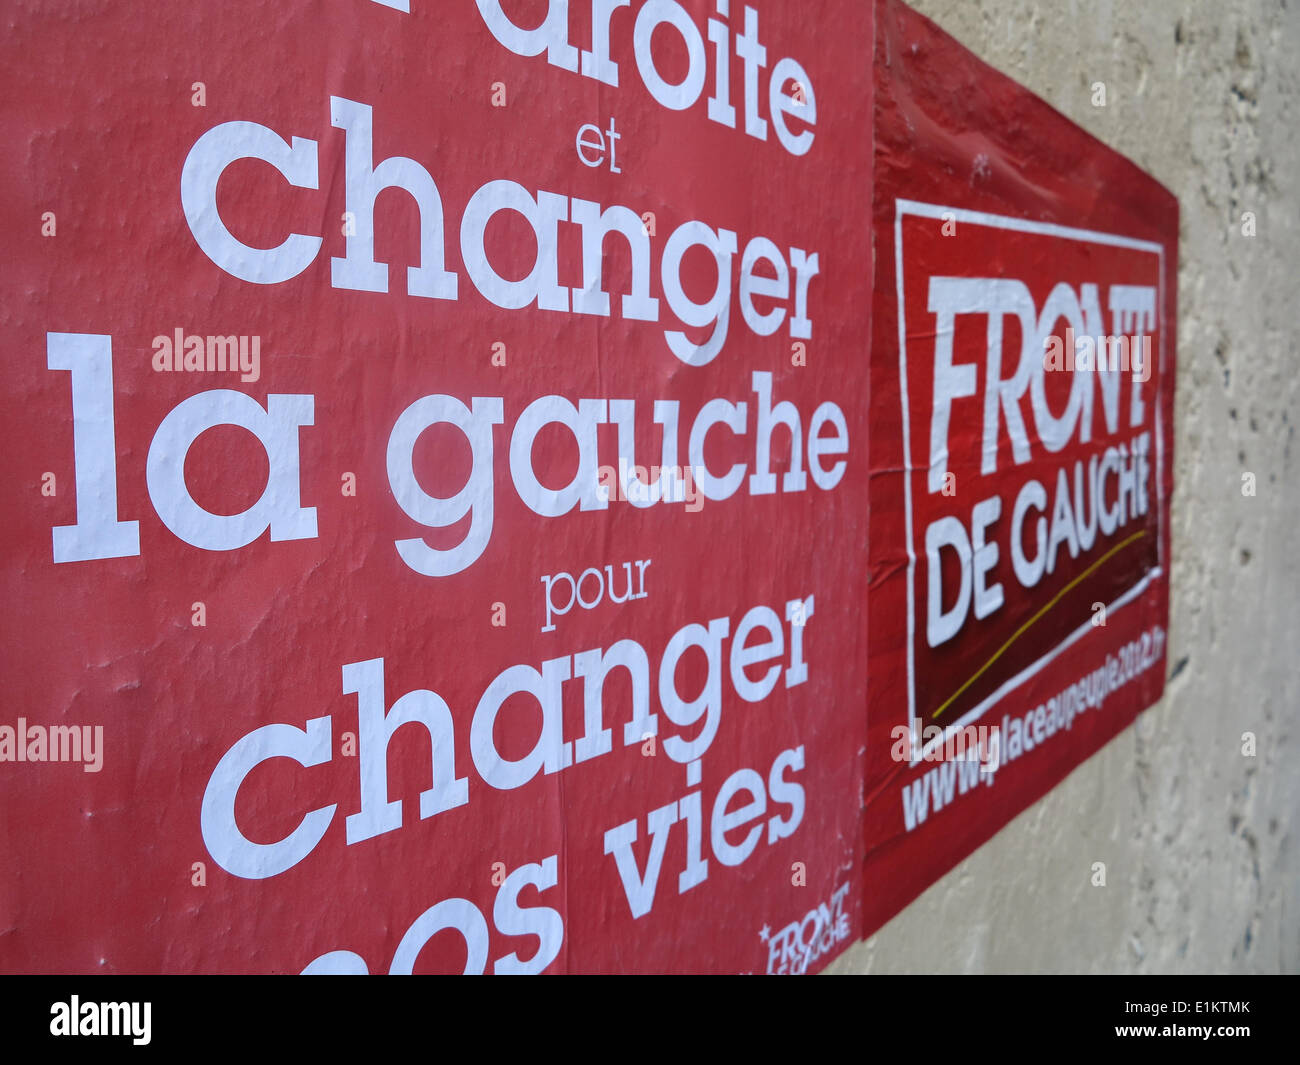 Left wing party propaganda - Stock Image